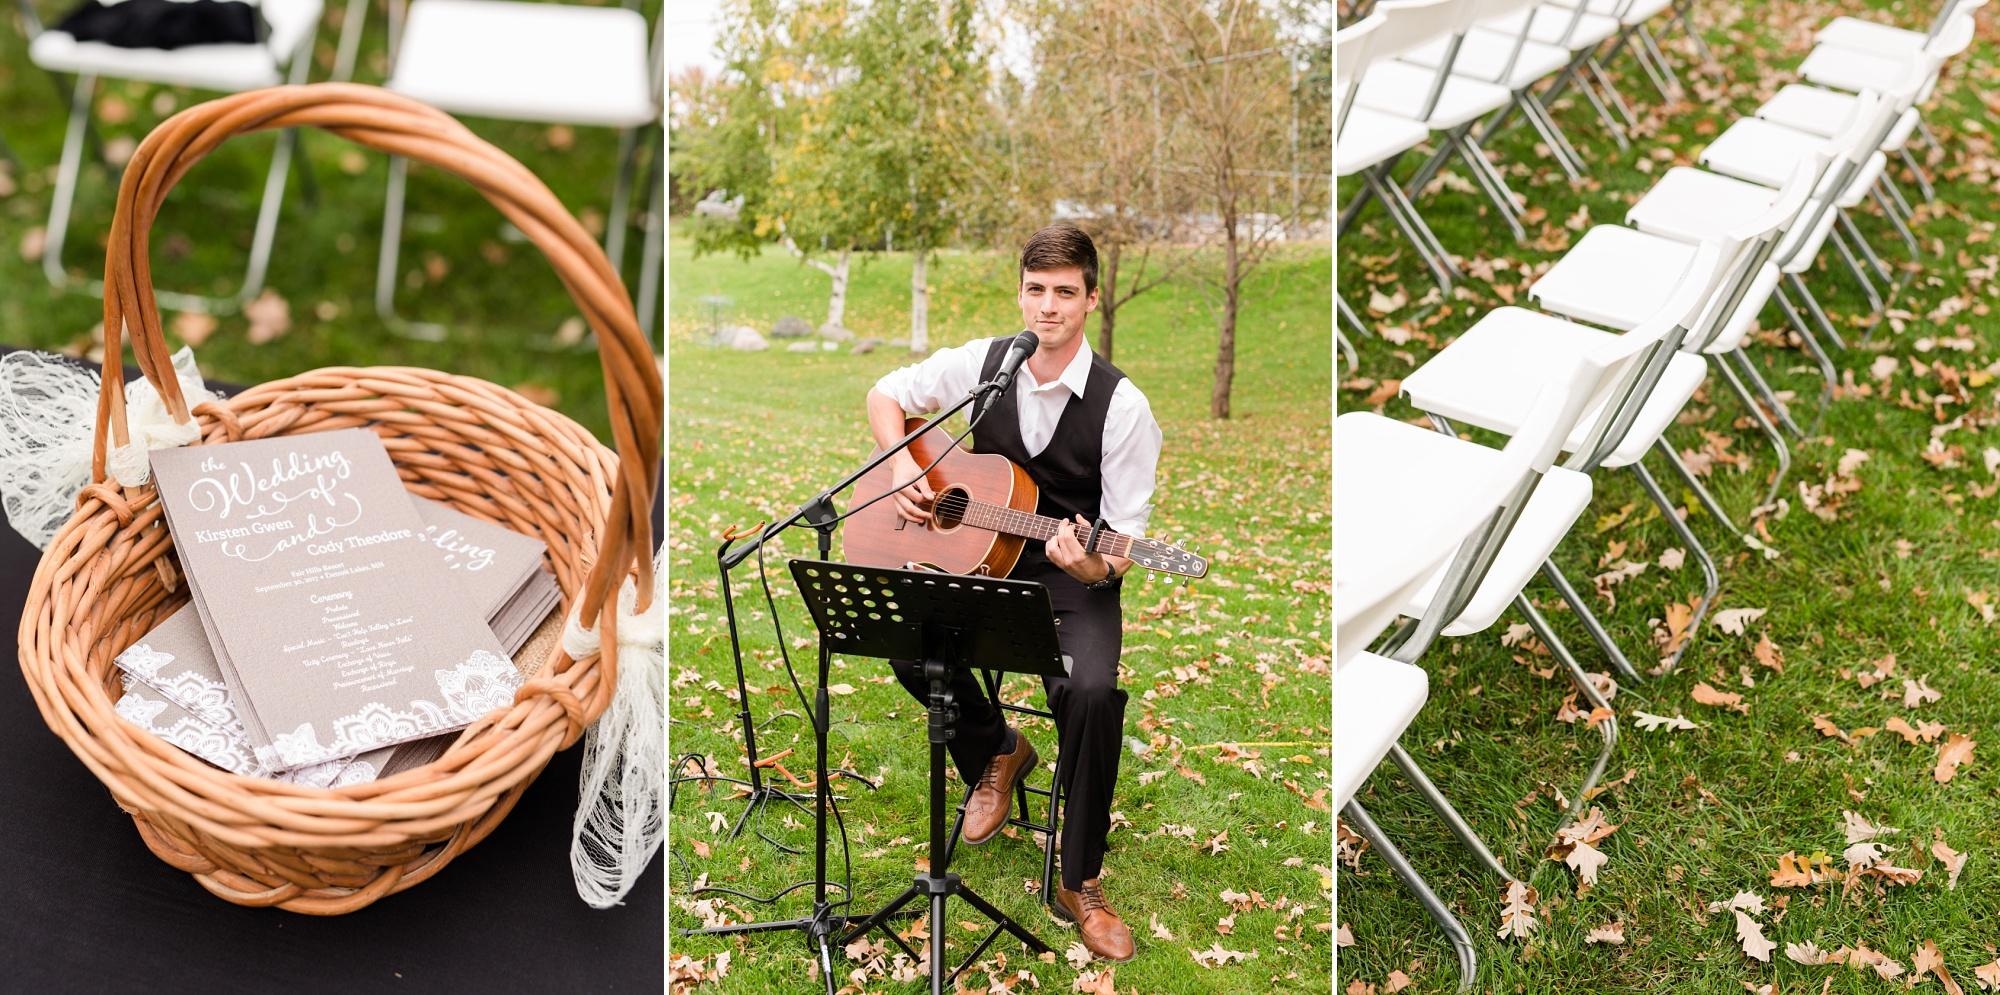 AmberLangerudPhotography_Fair Hills Resort Lakeside Wedding in Minnesota_3459.jpg